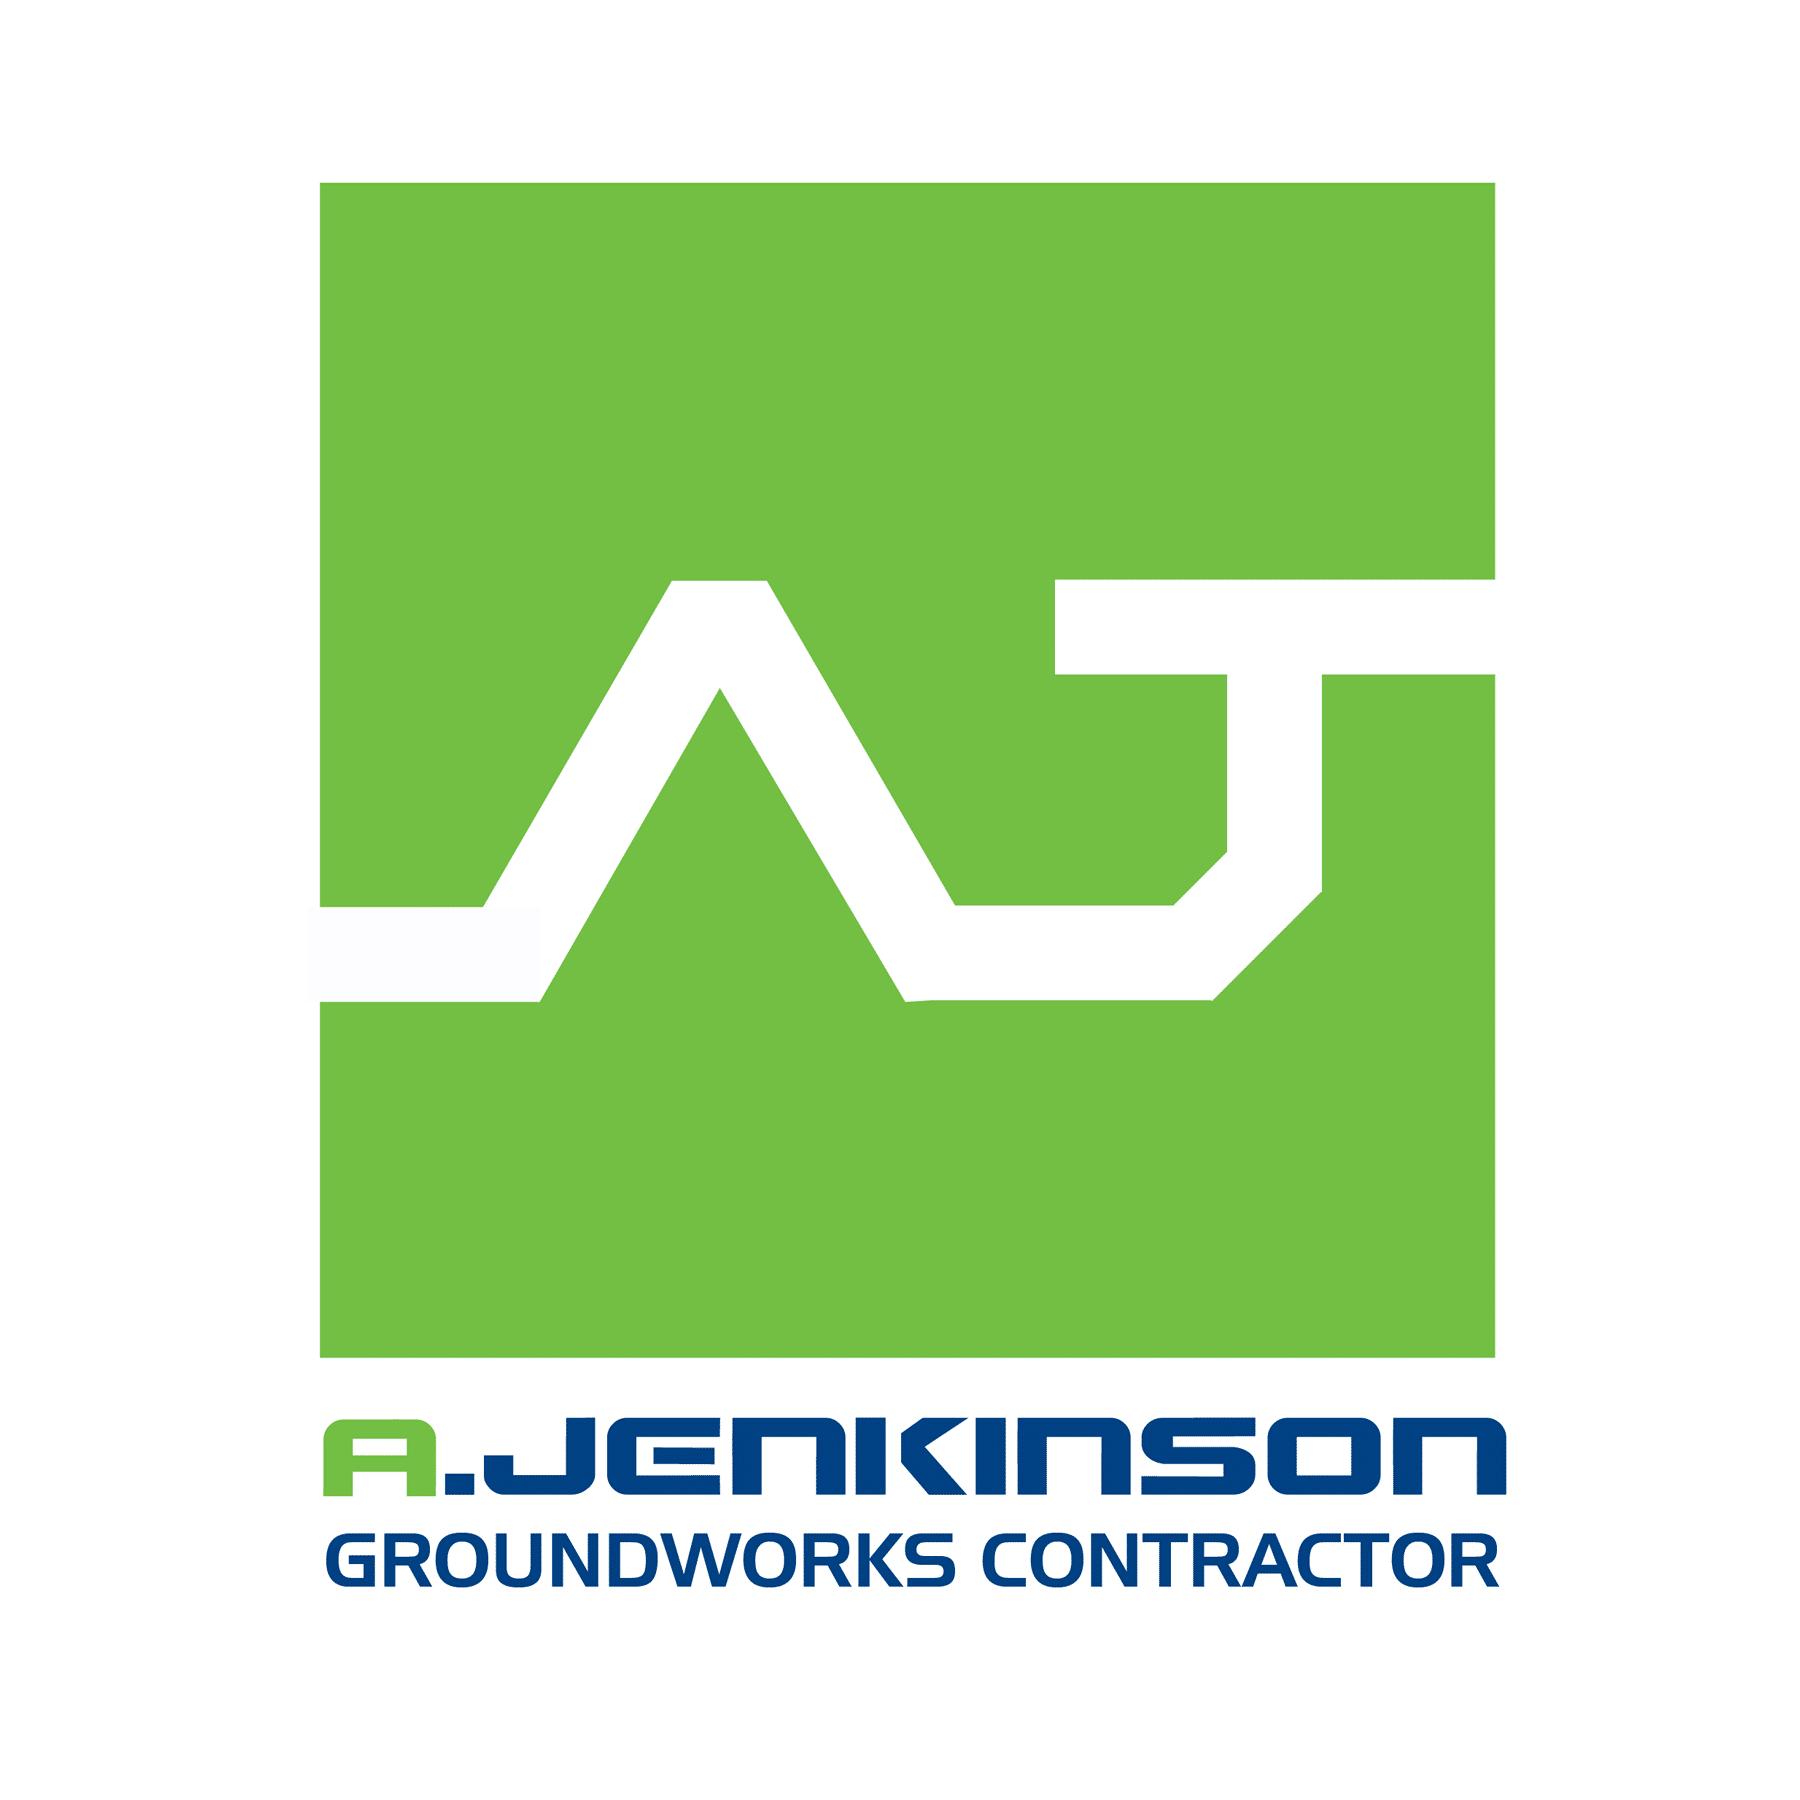 A-Jenkinson Logo